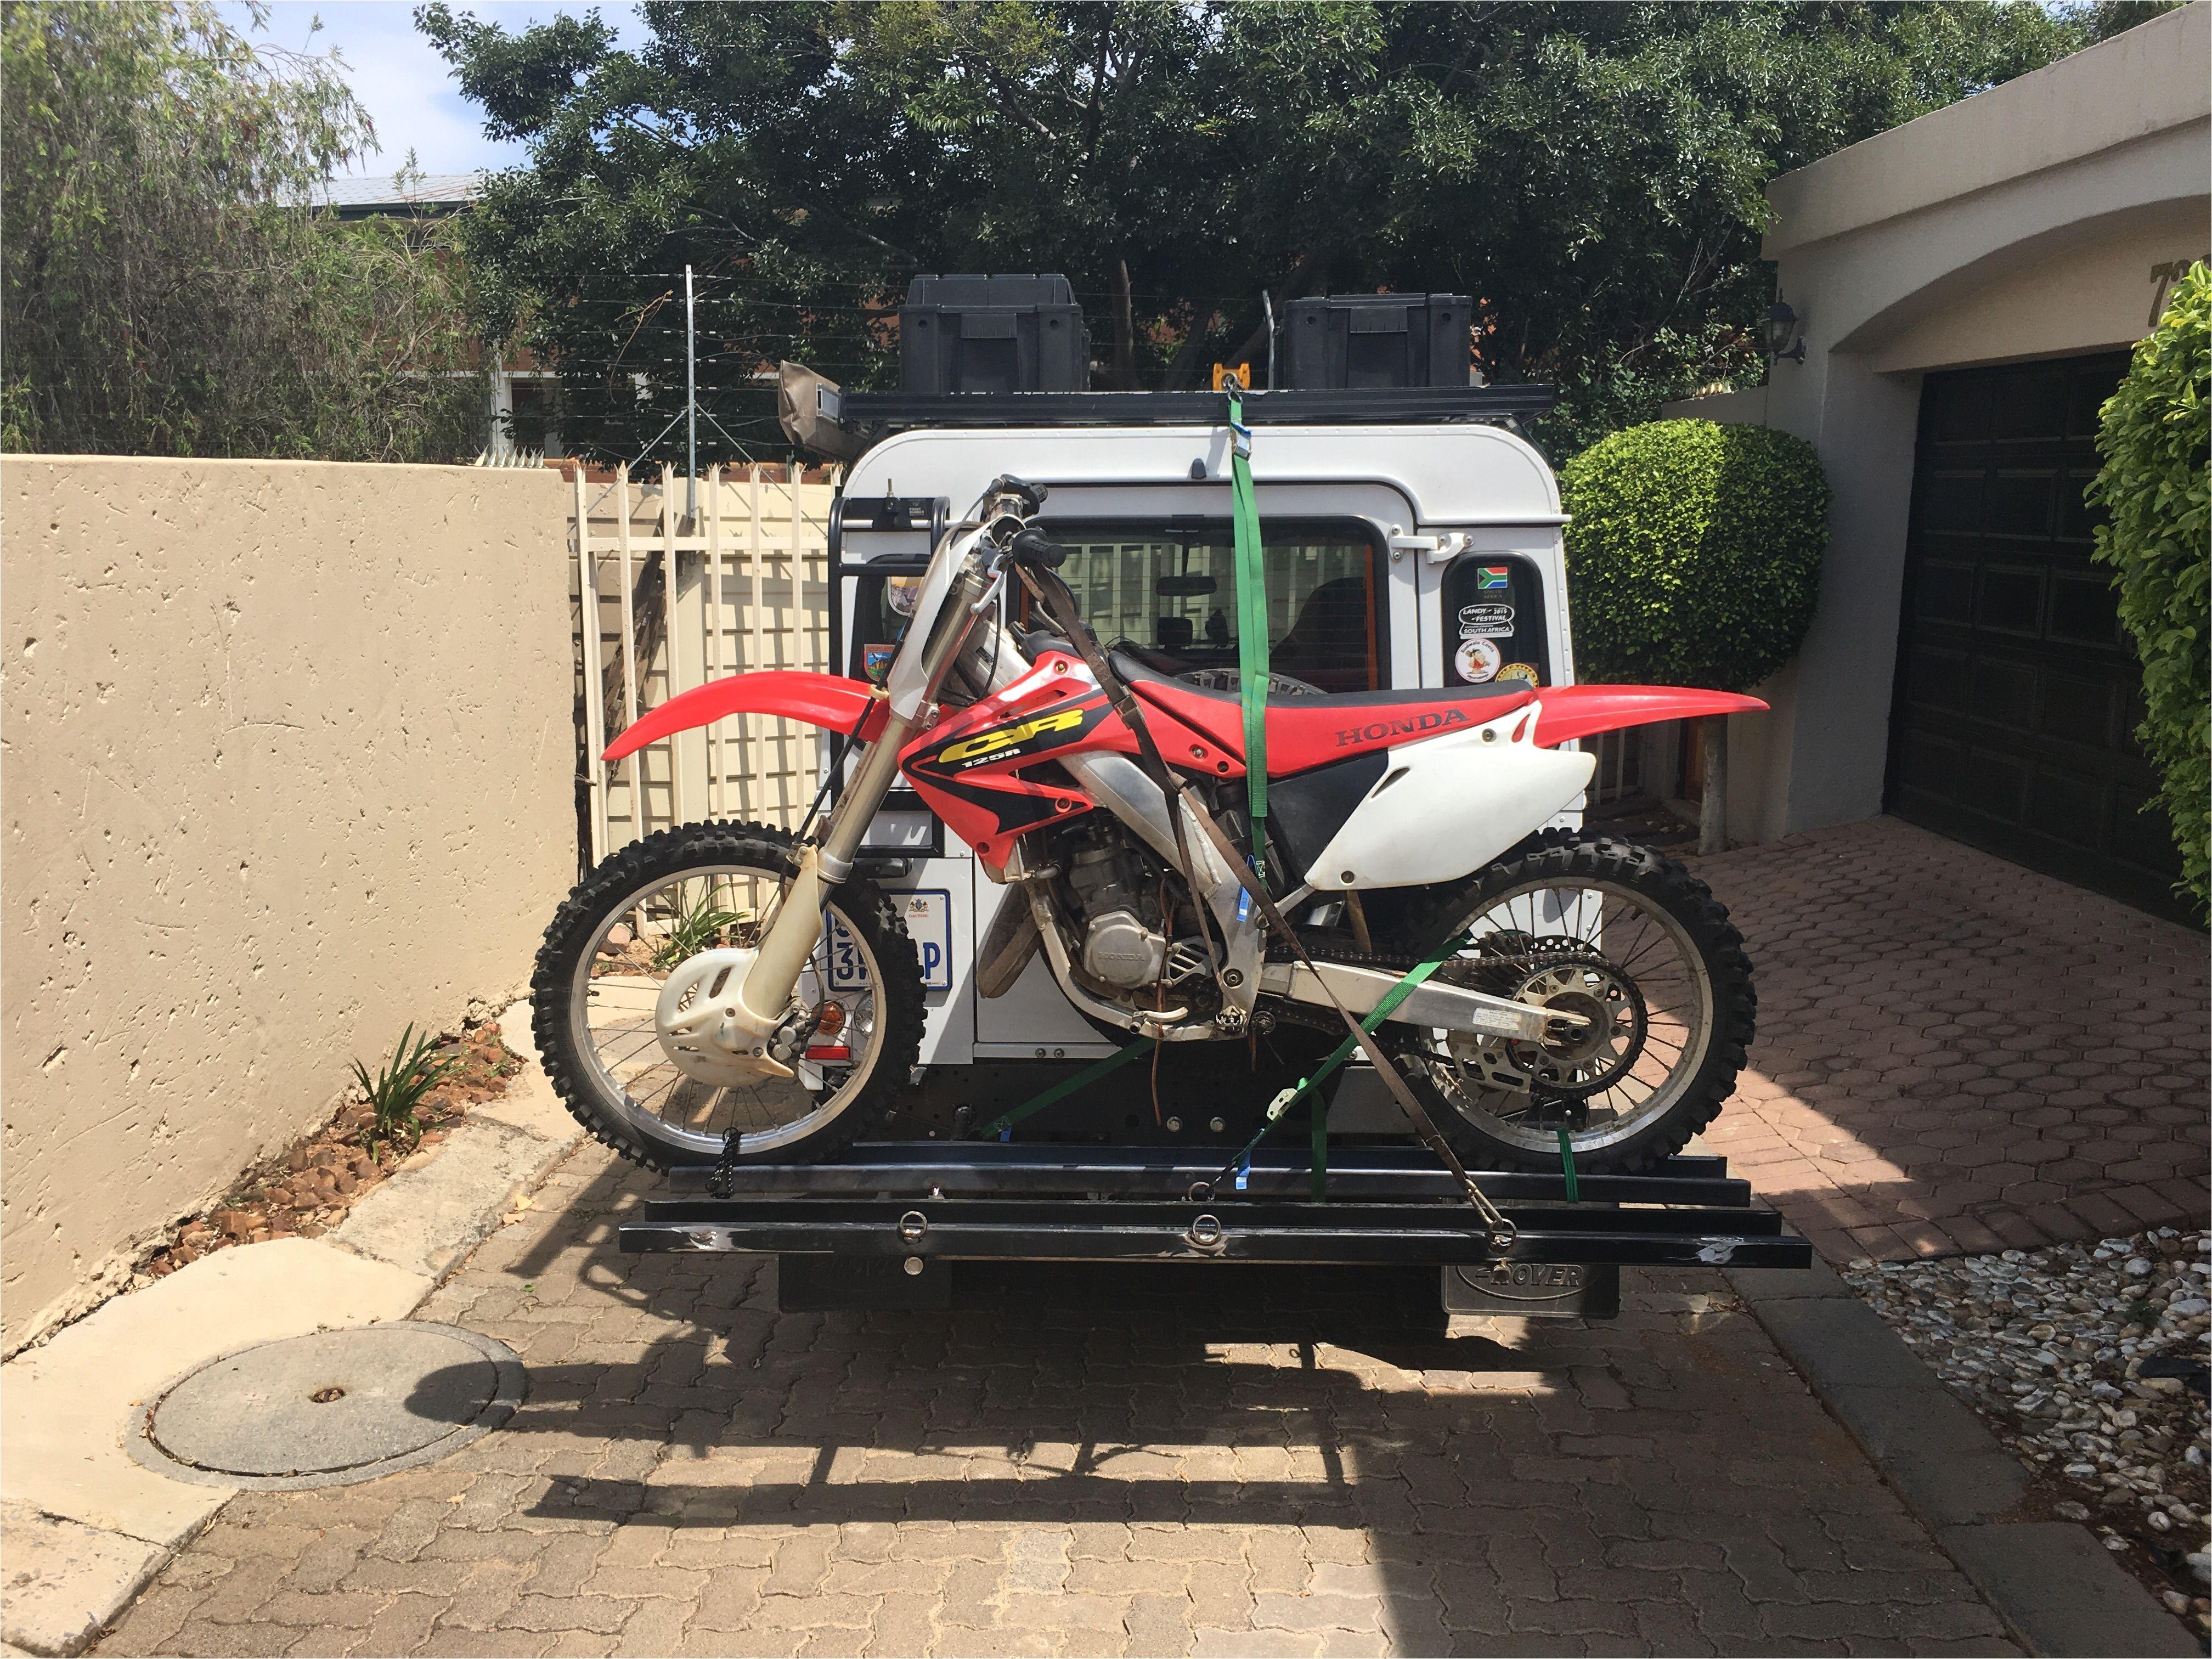 custom dirt bike rack specifically designed for land rover defender bumper